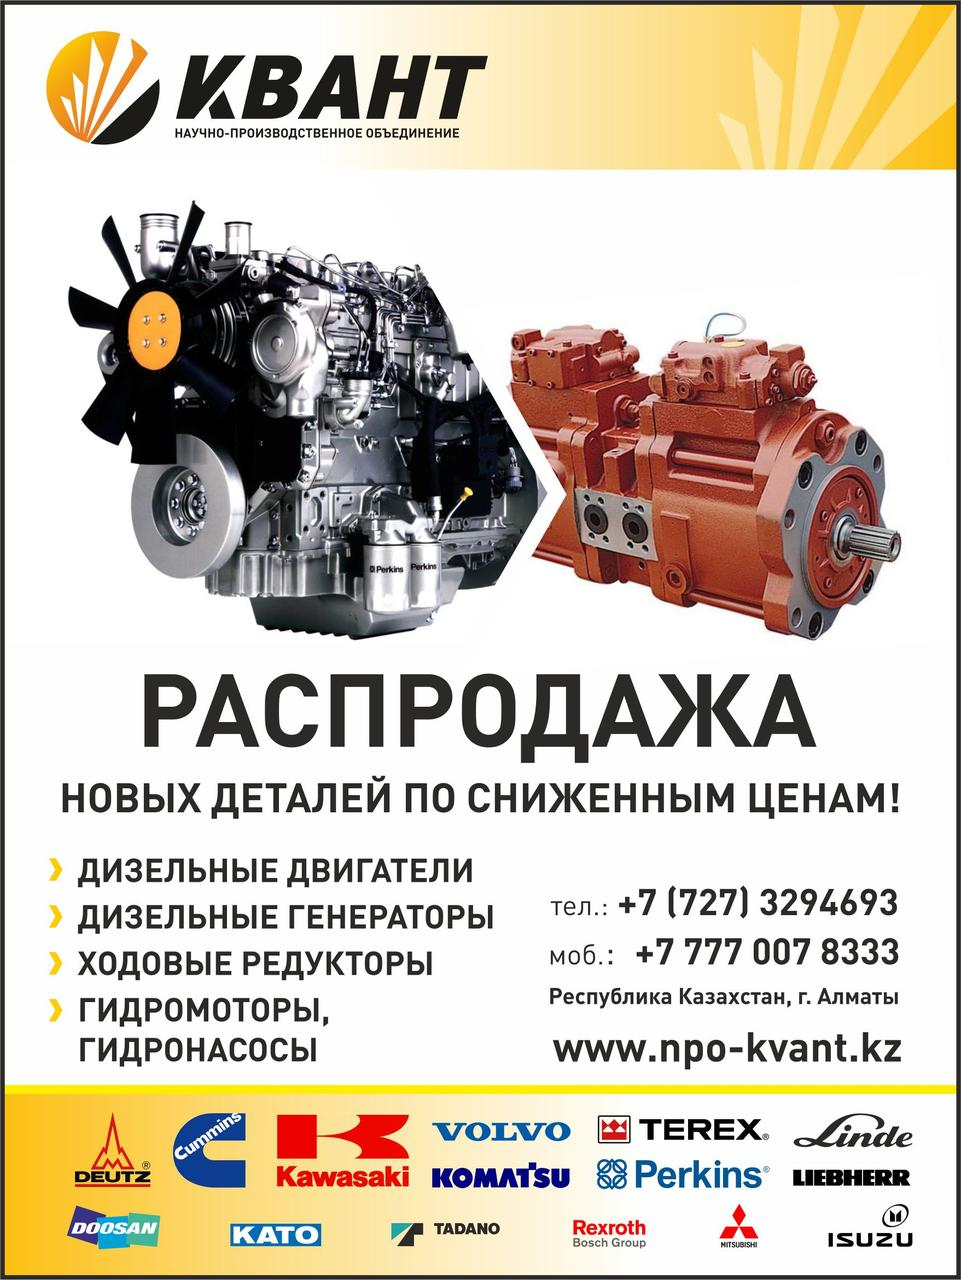 Двигатель Volvo D9, Volvo D12, Volvo D12-A, Volvo D13, Volvo TD 100, TD 101, Volvo TD 102, THD 100, THD 101